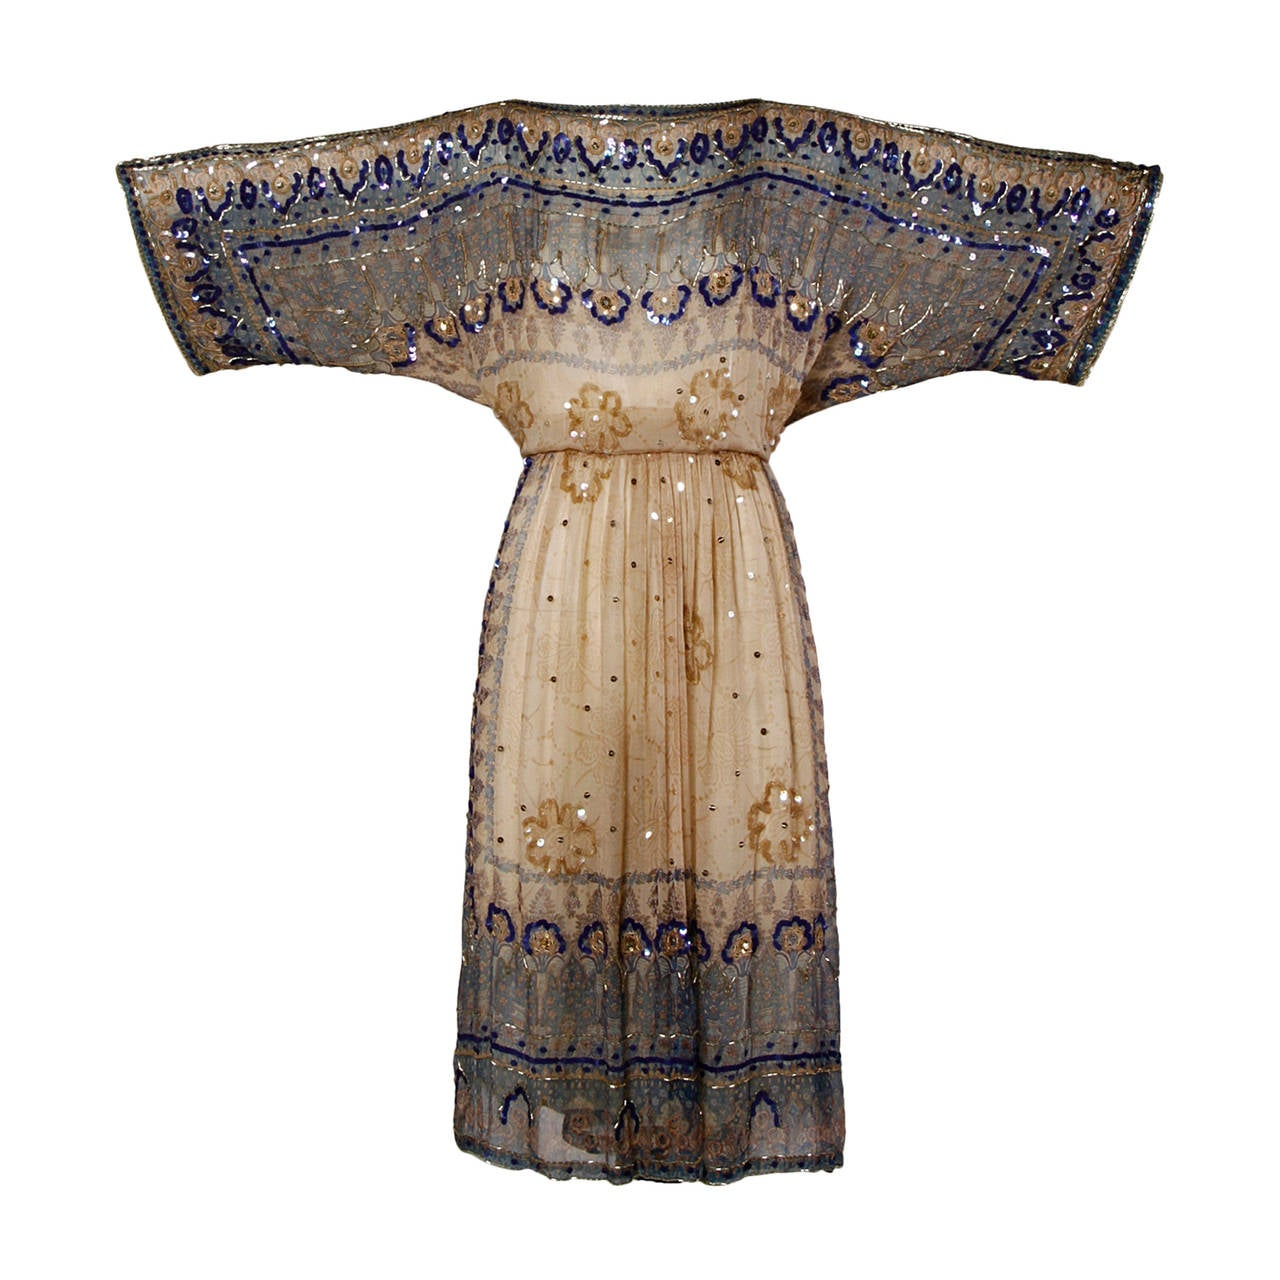 Judith Ann for Bullock's Wilshire Vintage 1970s Silk India Print Dress 1